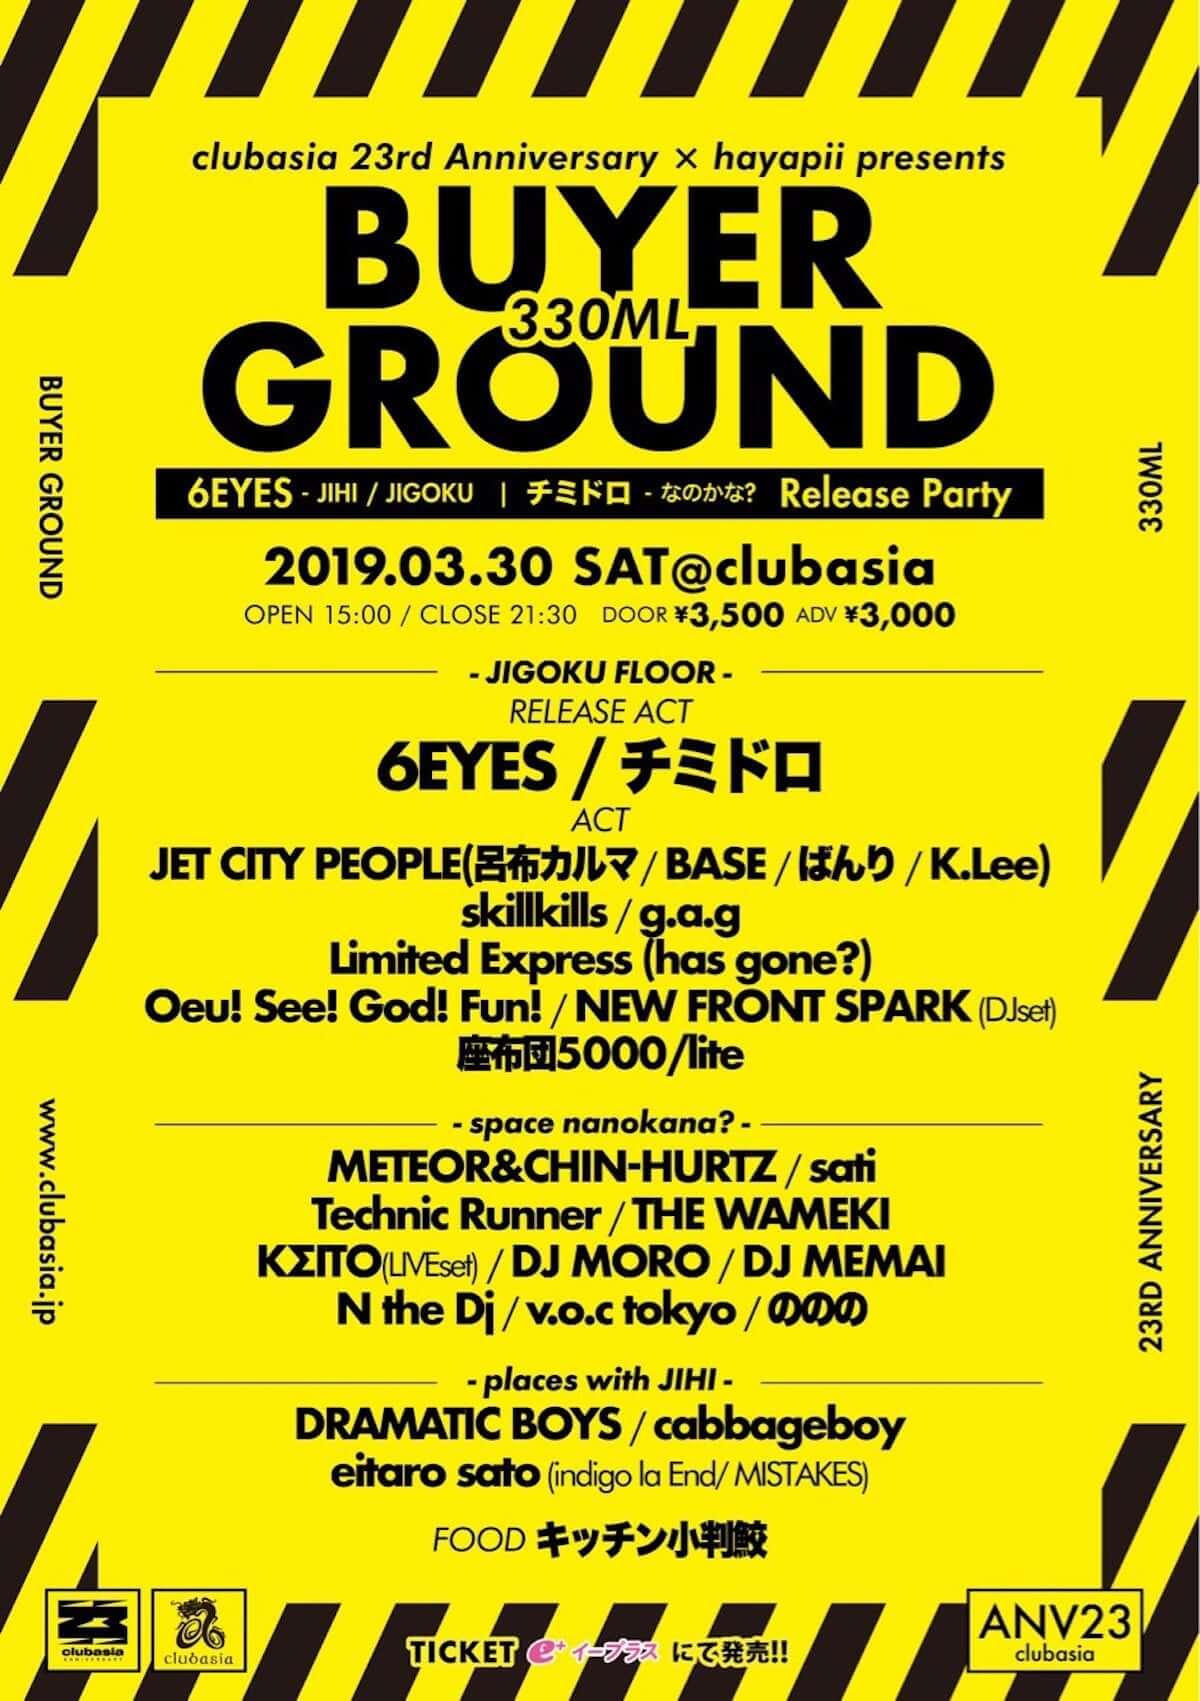 clubasiaとhayapiiによる共同企画イベントが3月30日に東京・渋谷clubasiaで開催|JET CITY PEOPLE、チミドロが共演 music190312_clubasia_1-1200x1701